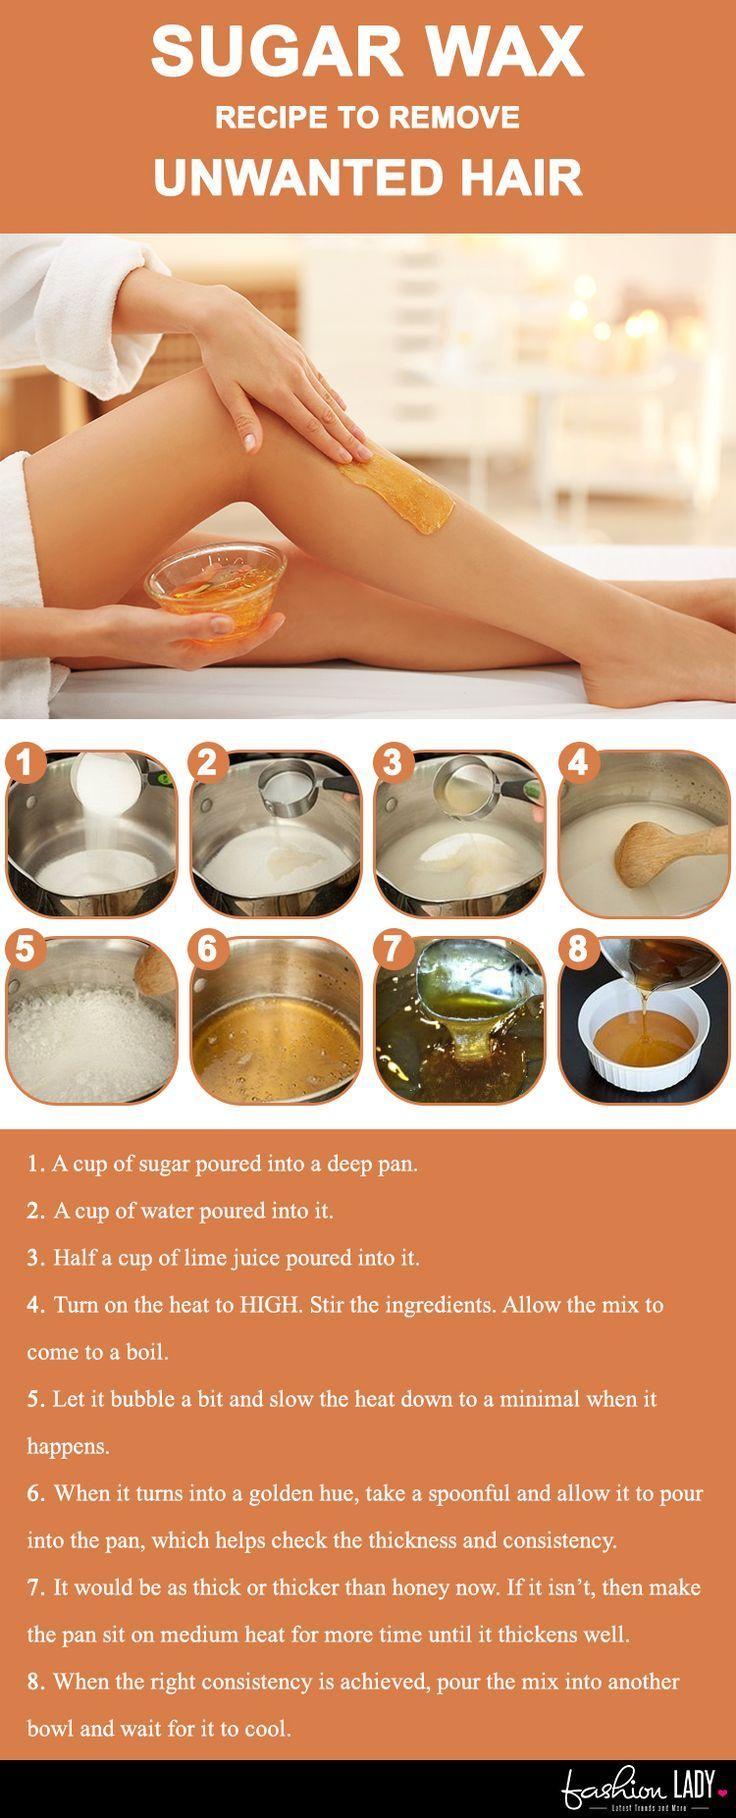 Sugar Wax Recipe To Remove Unwanted Hair Sugar Wax Recipe Unwanted Hair Removal Sugar Waxing